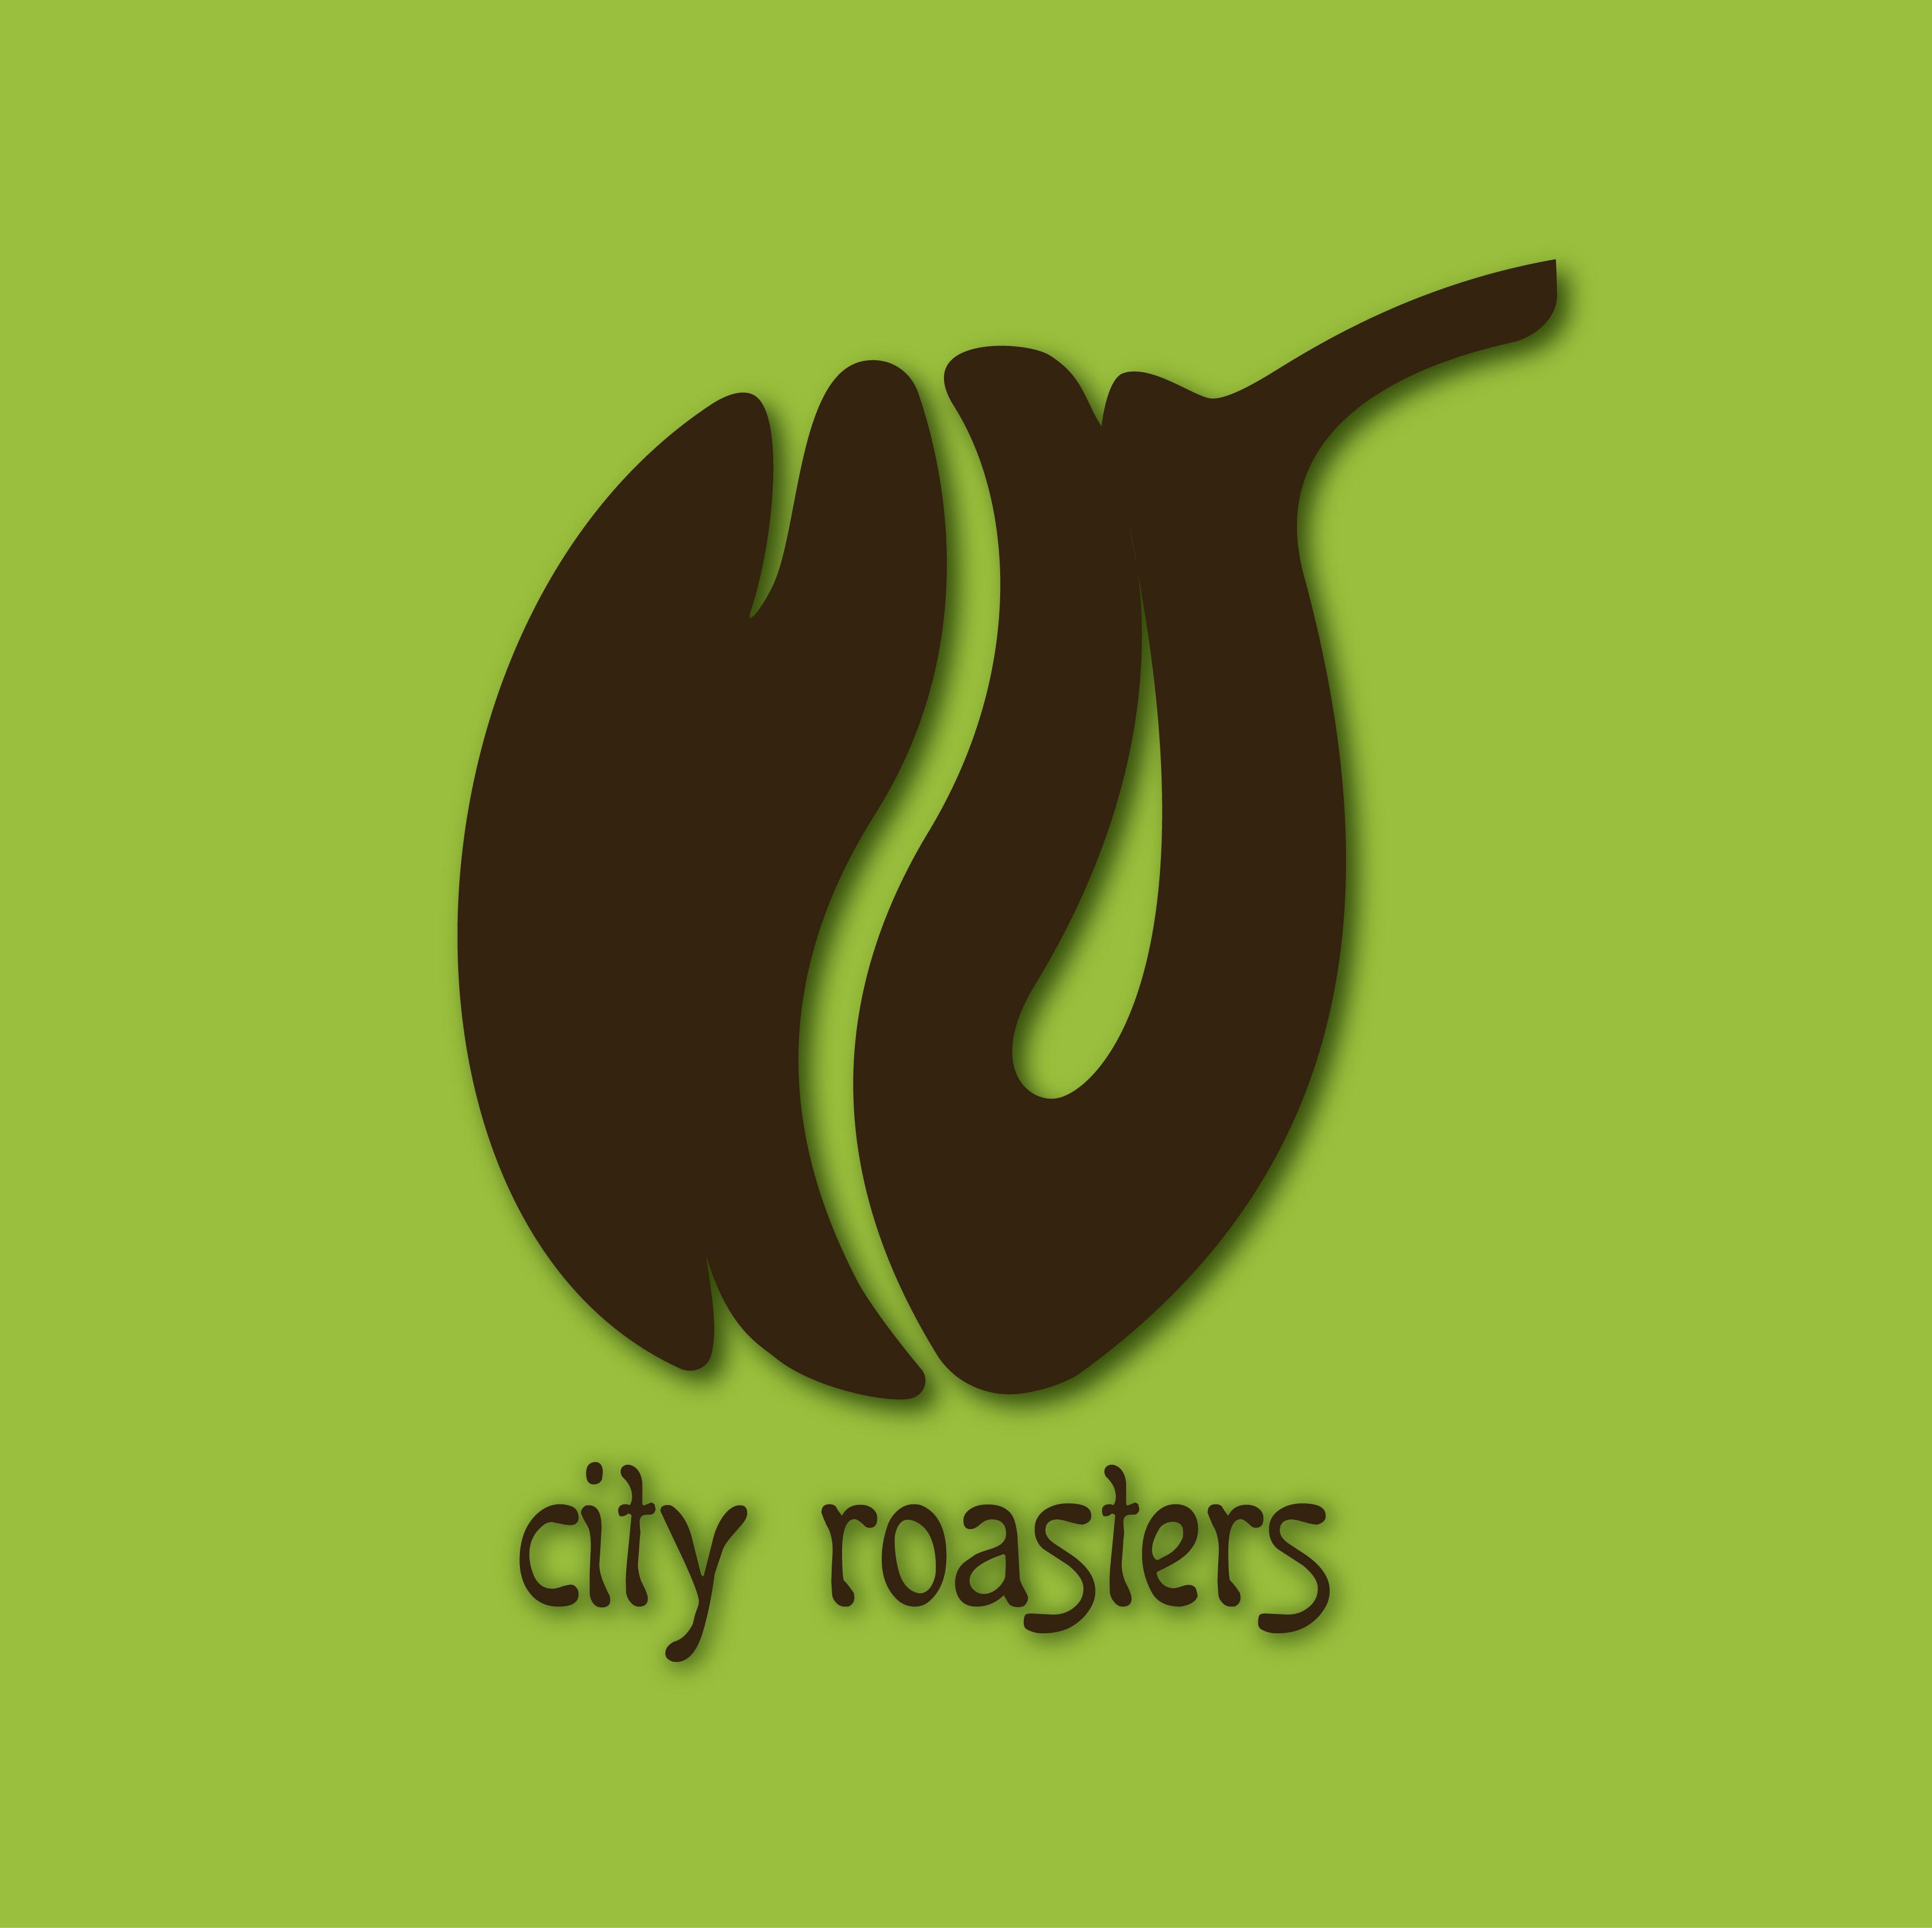 логотип для кофейной компании фото f_889541ad531b75b4.jpg